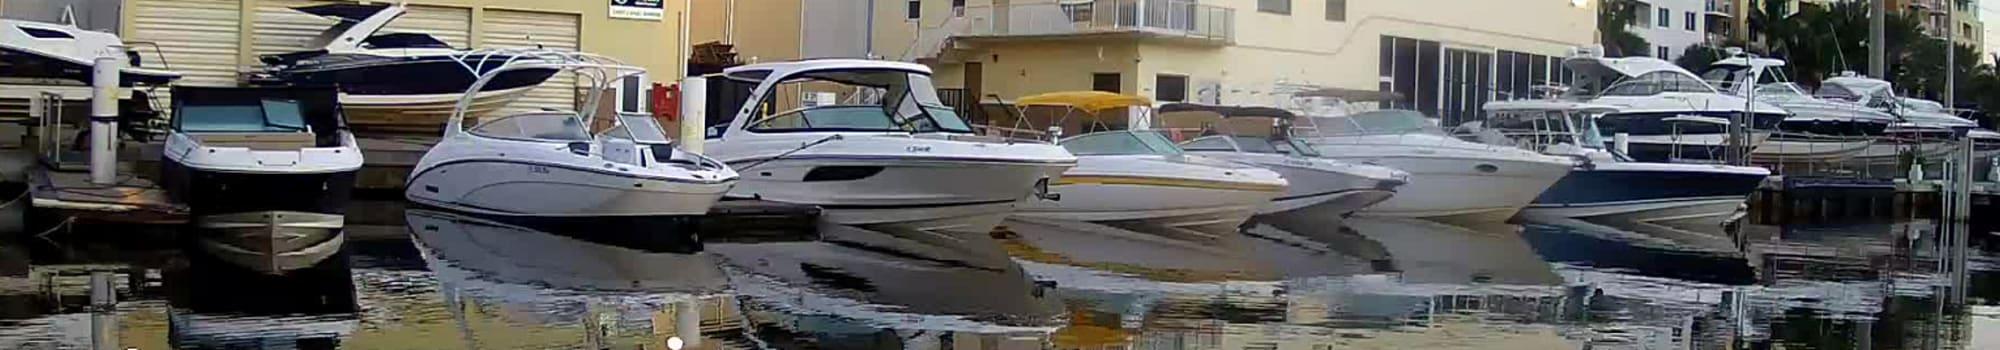 Photos of Aquamarina Hi-Lift in Aventura, Florida